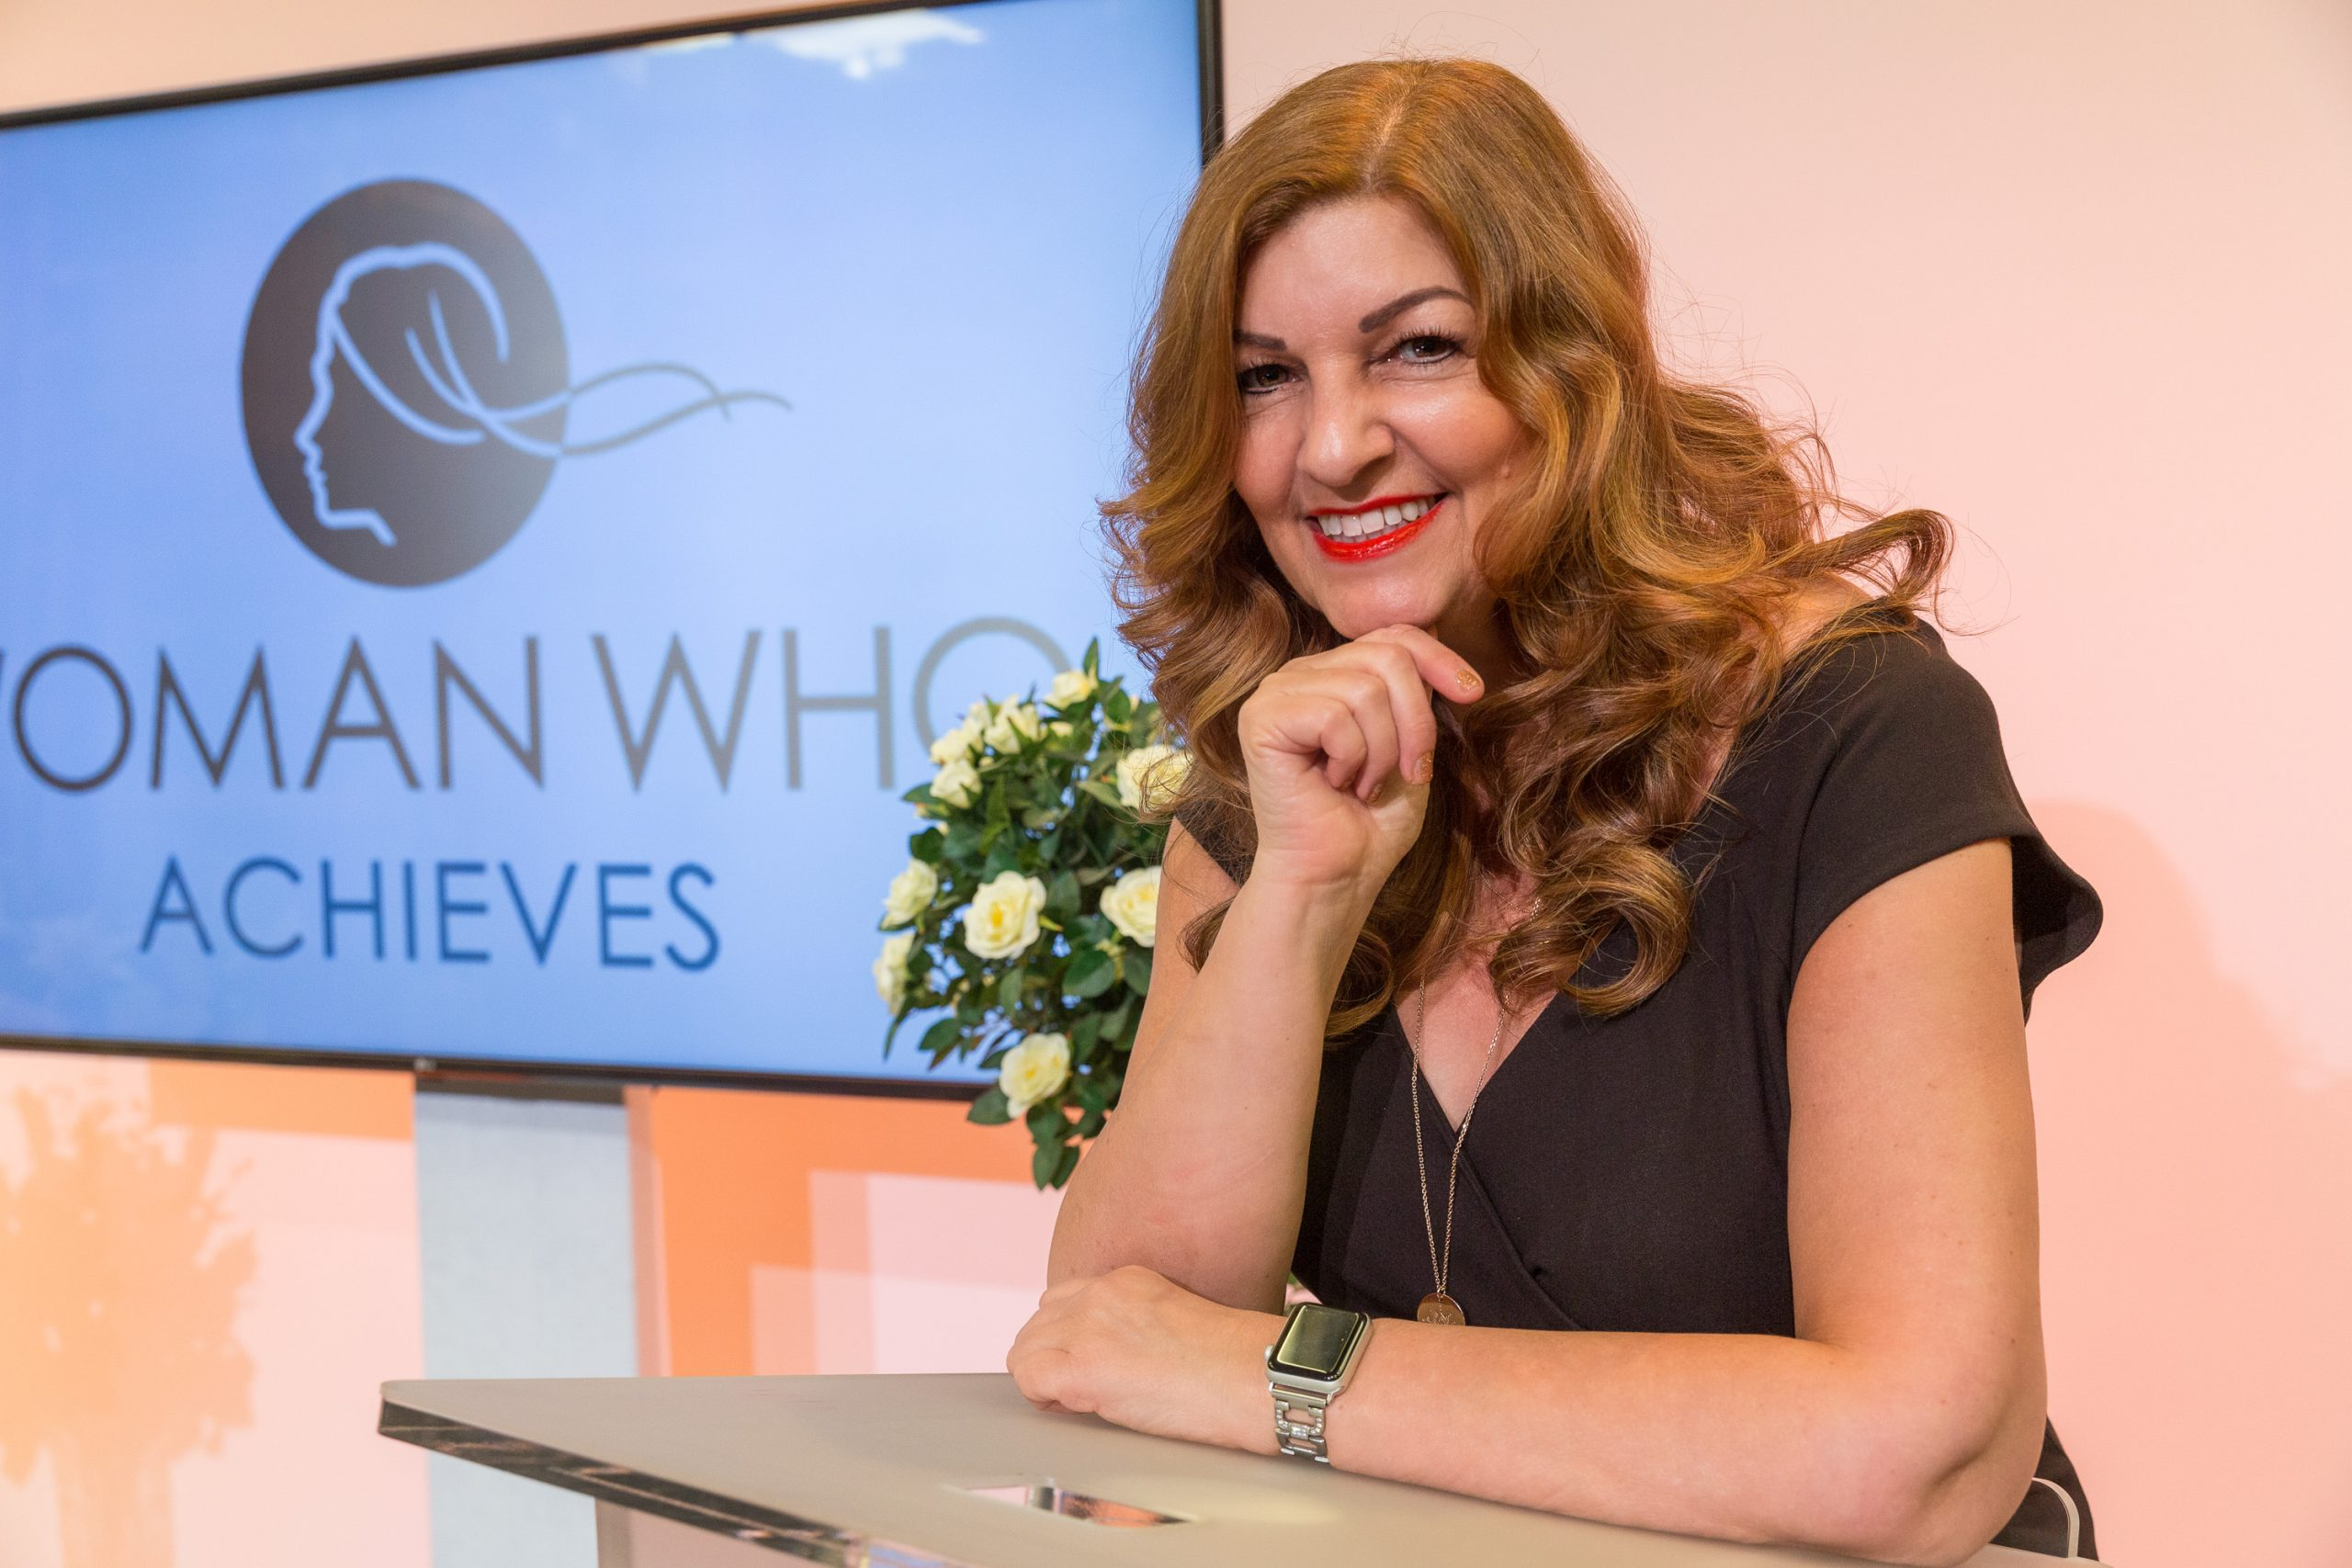 I Am A Woman Who, Sandra Garlick MBE, A Woman Who Achieves